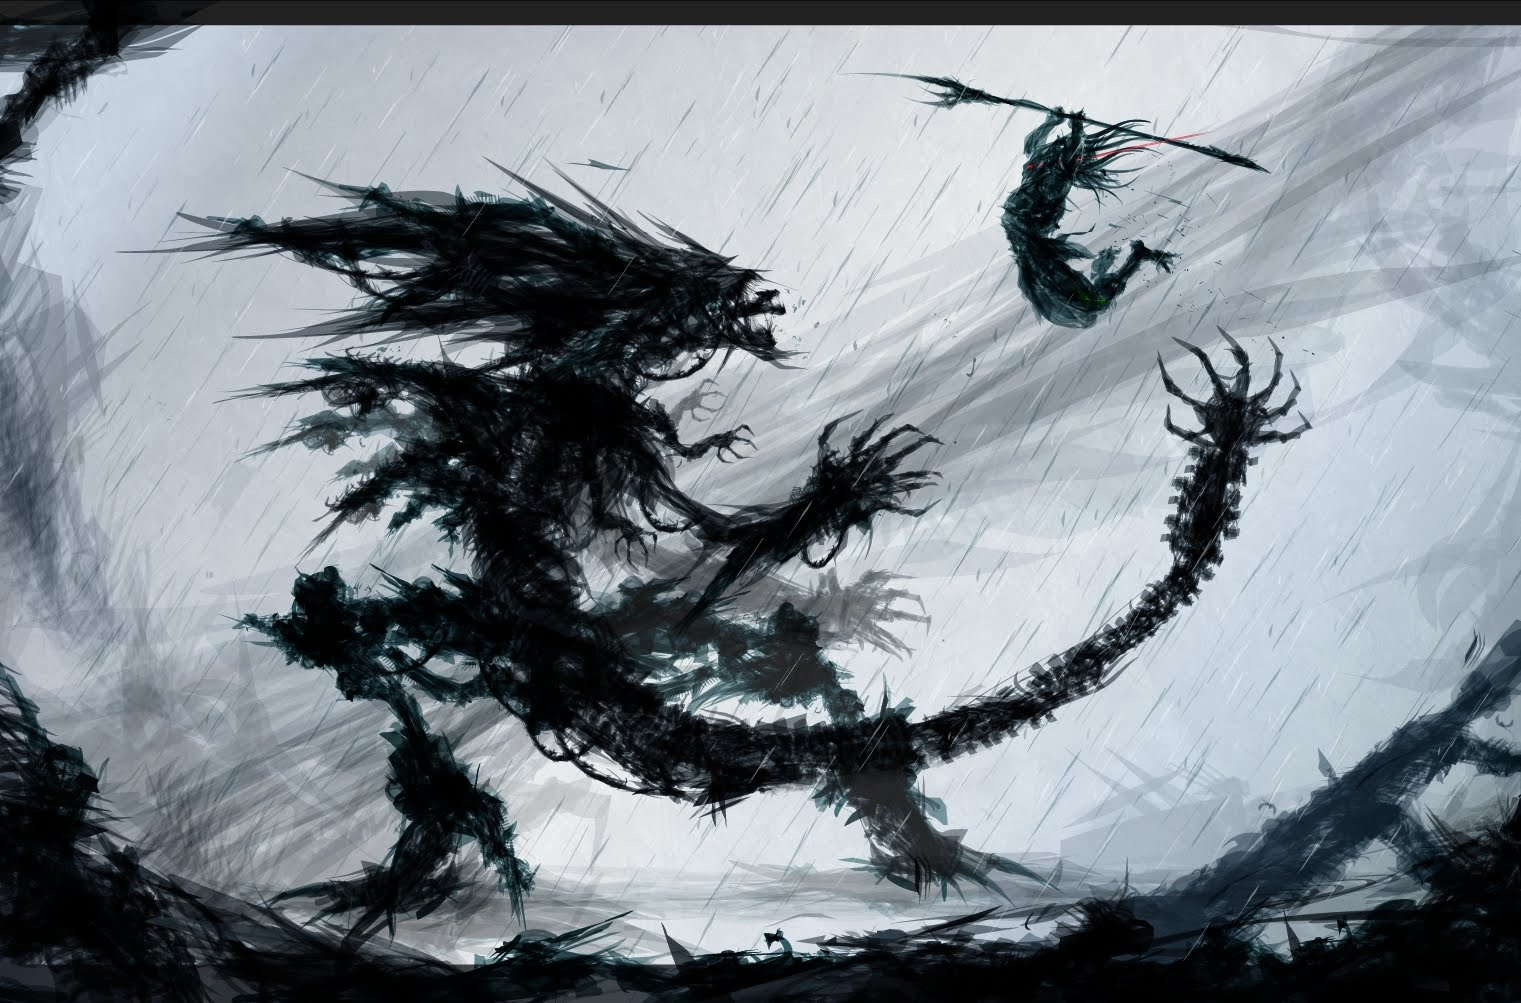 Drawn predator shadow dragon Predator Aliens Spear Kills